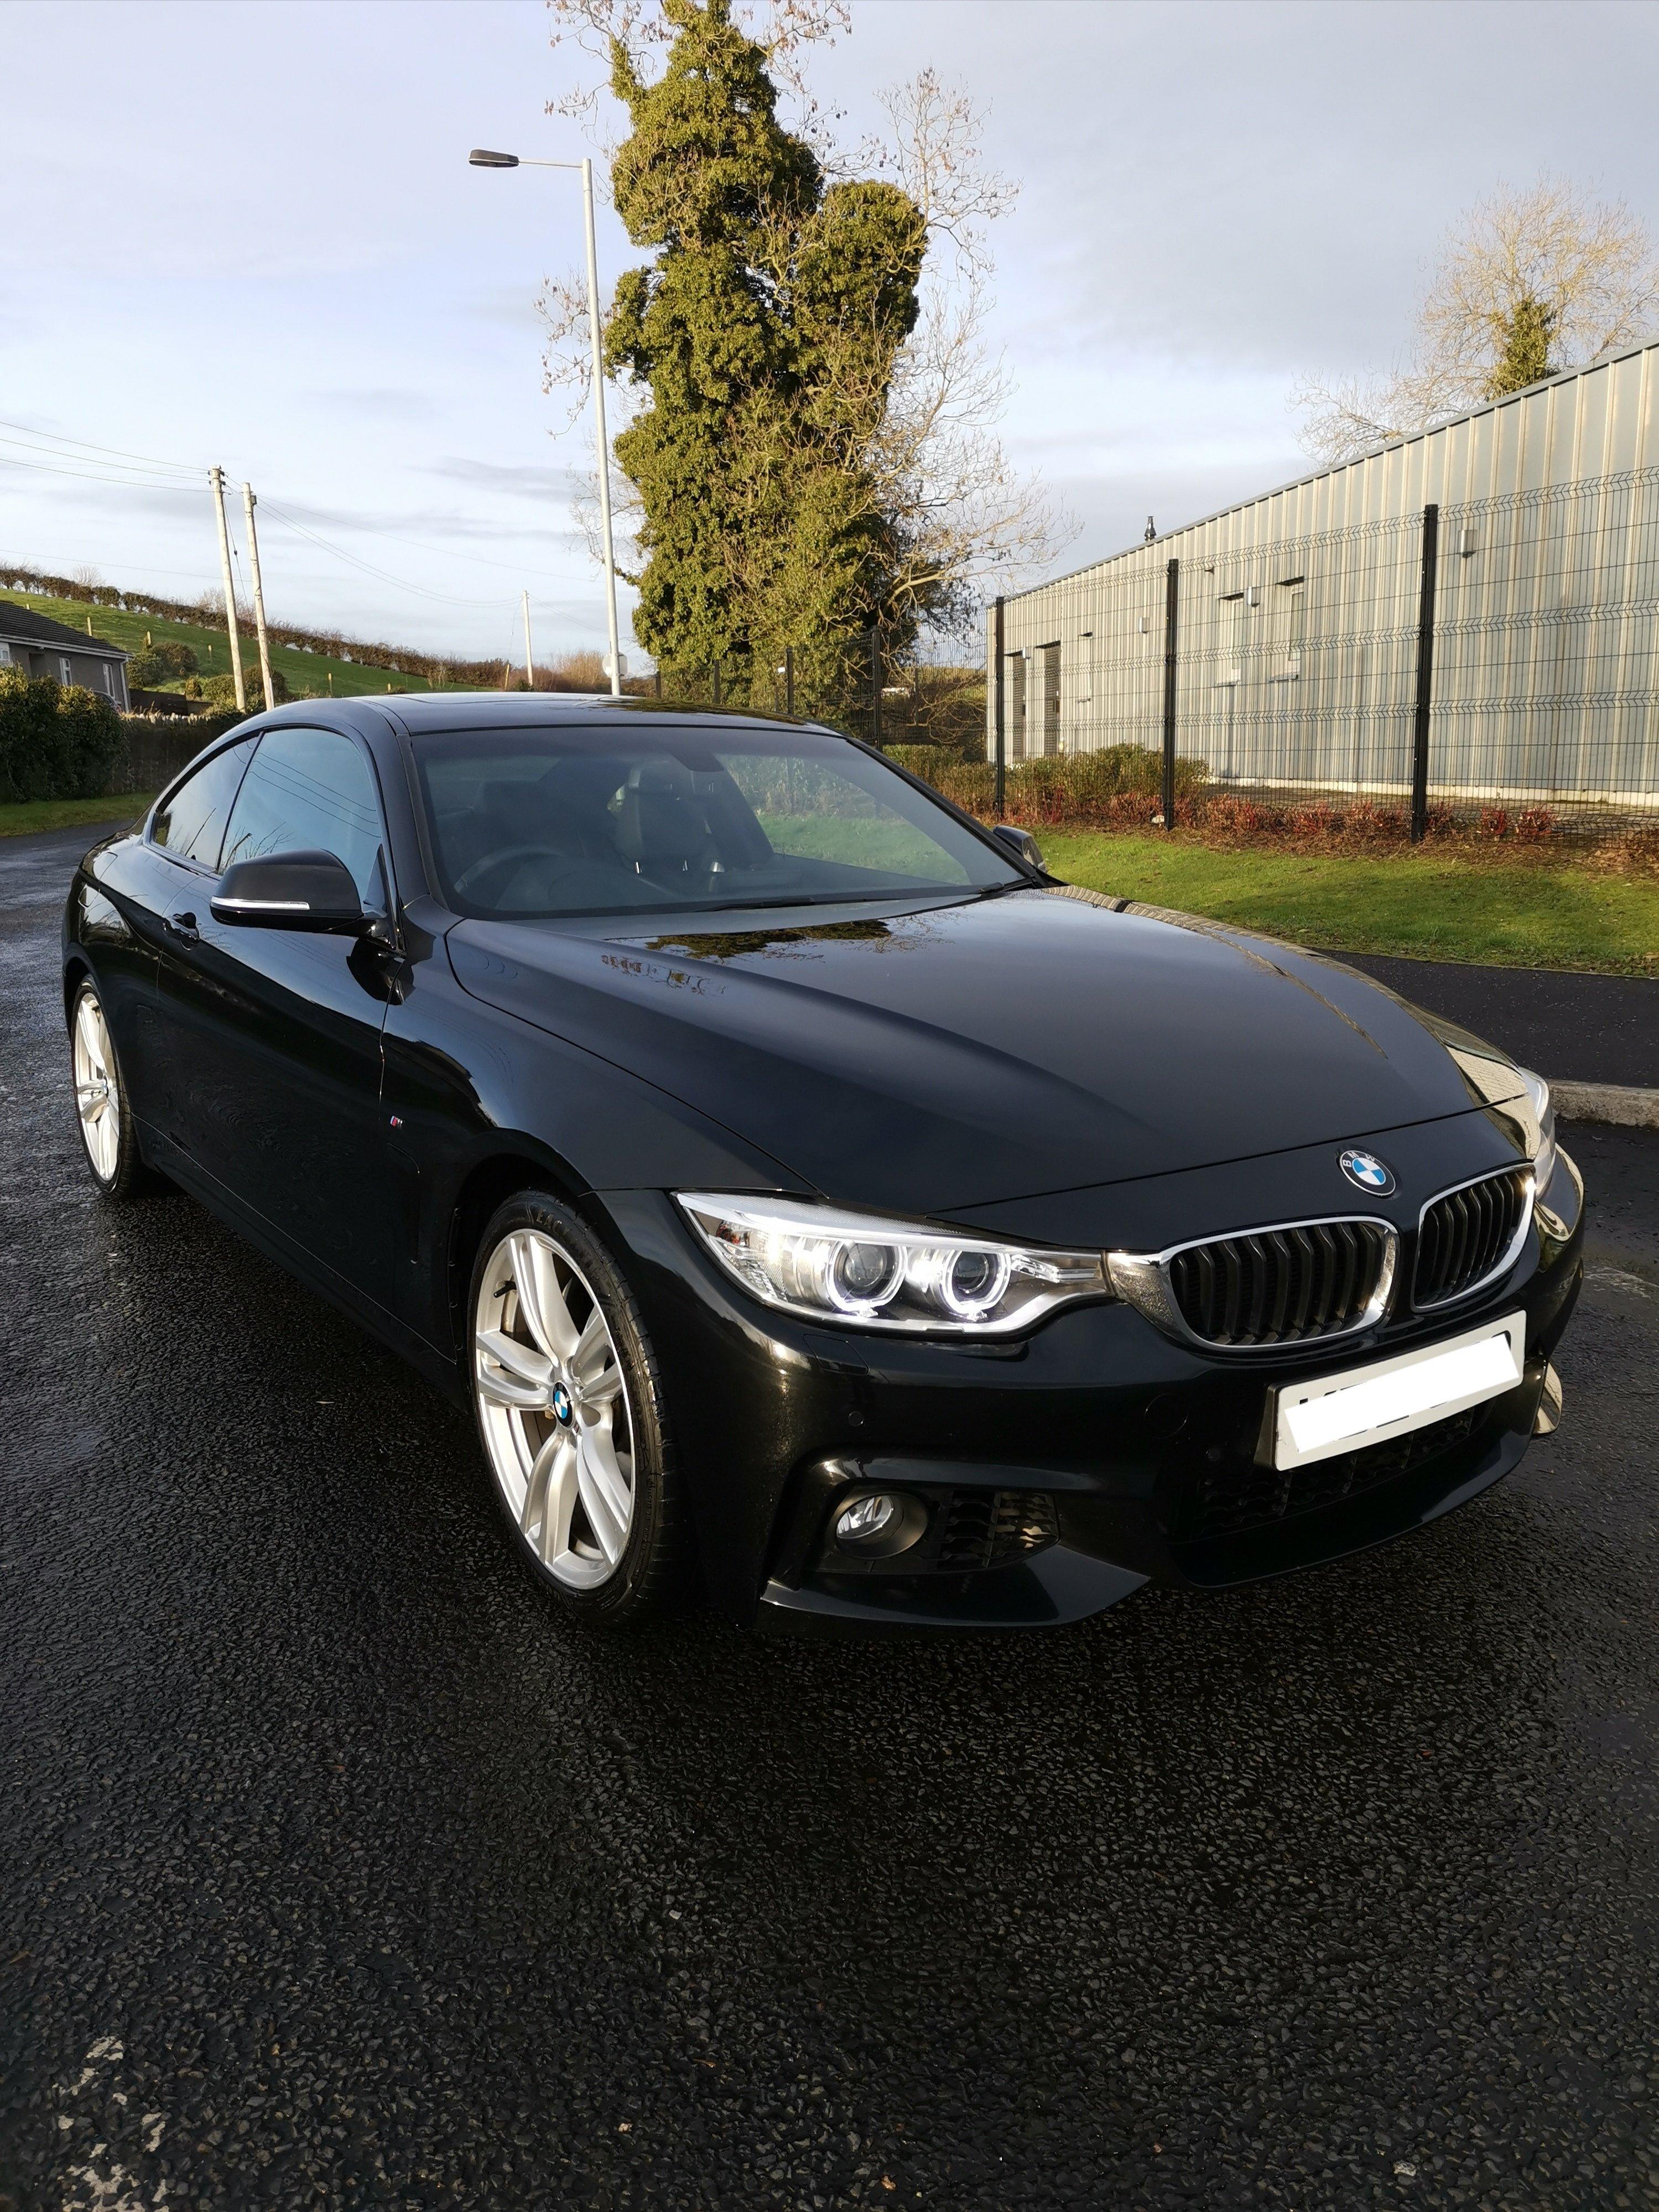 BMW 435i m sport - future classic